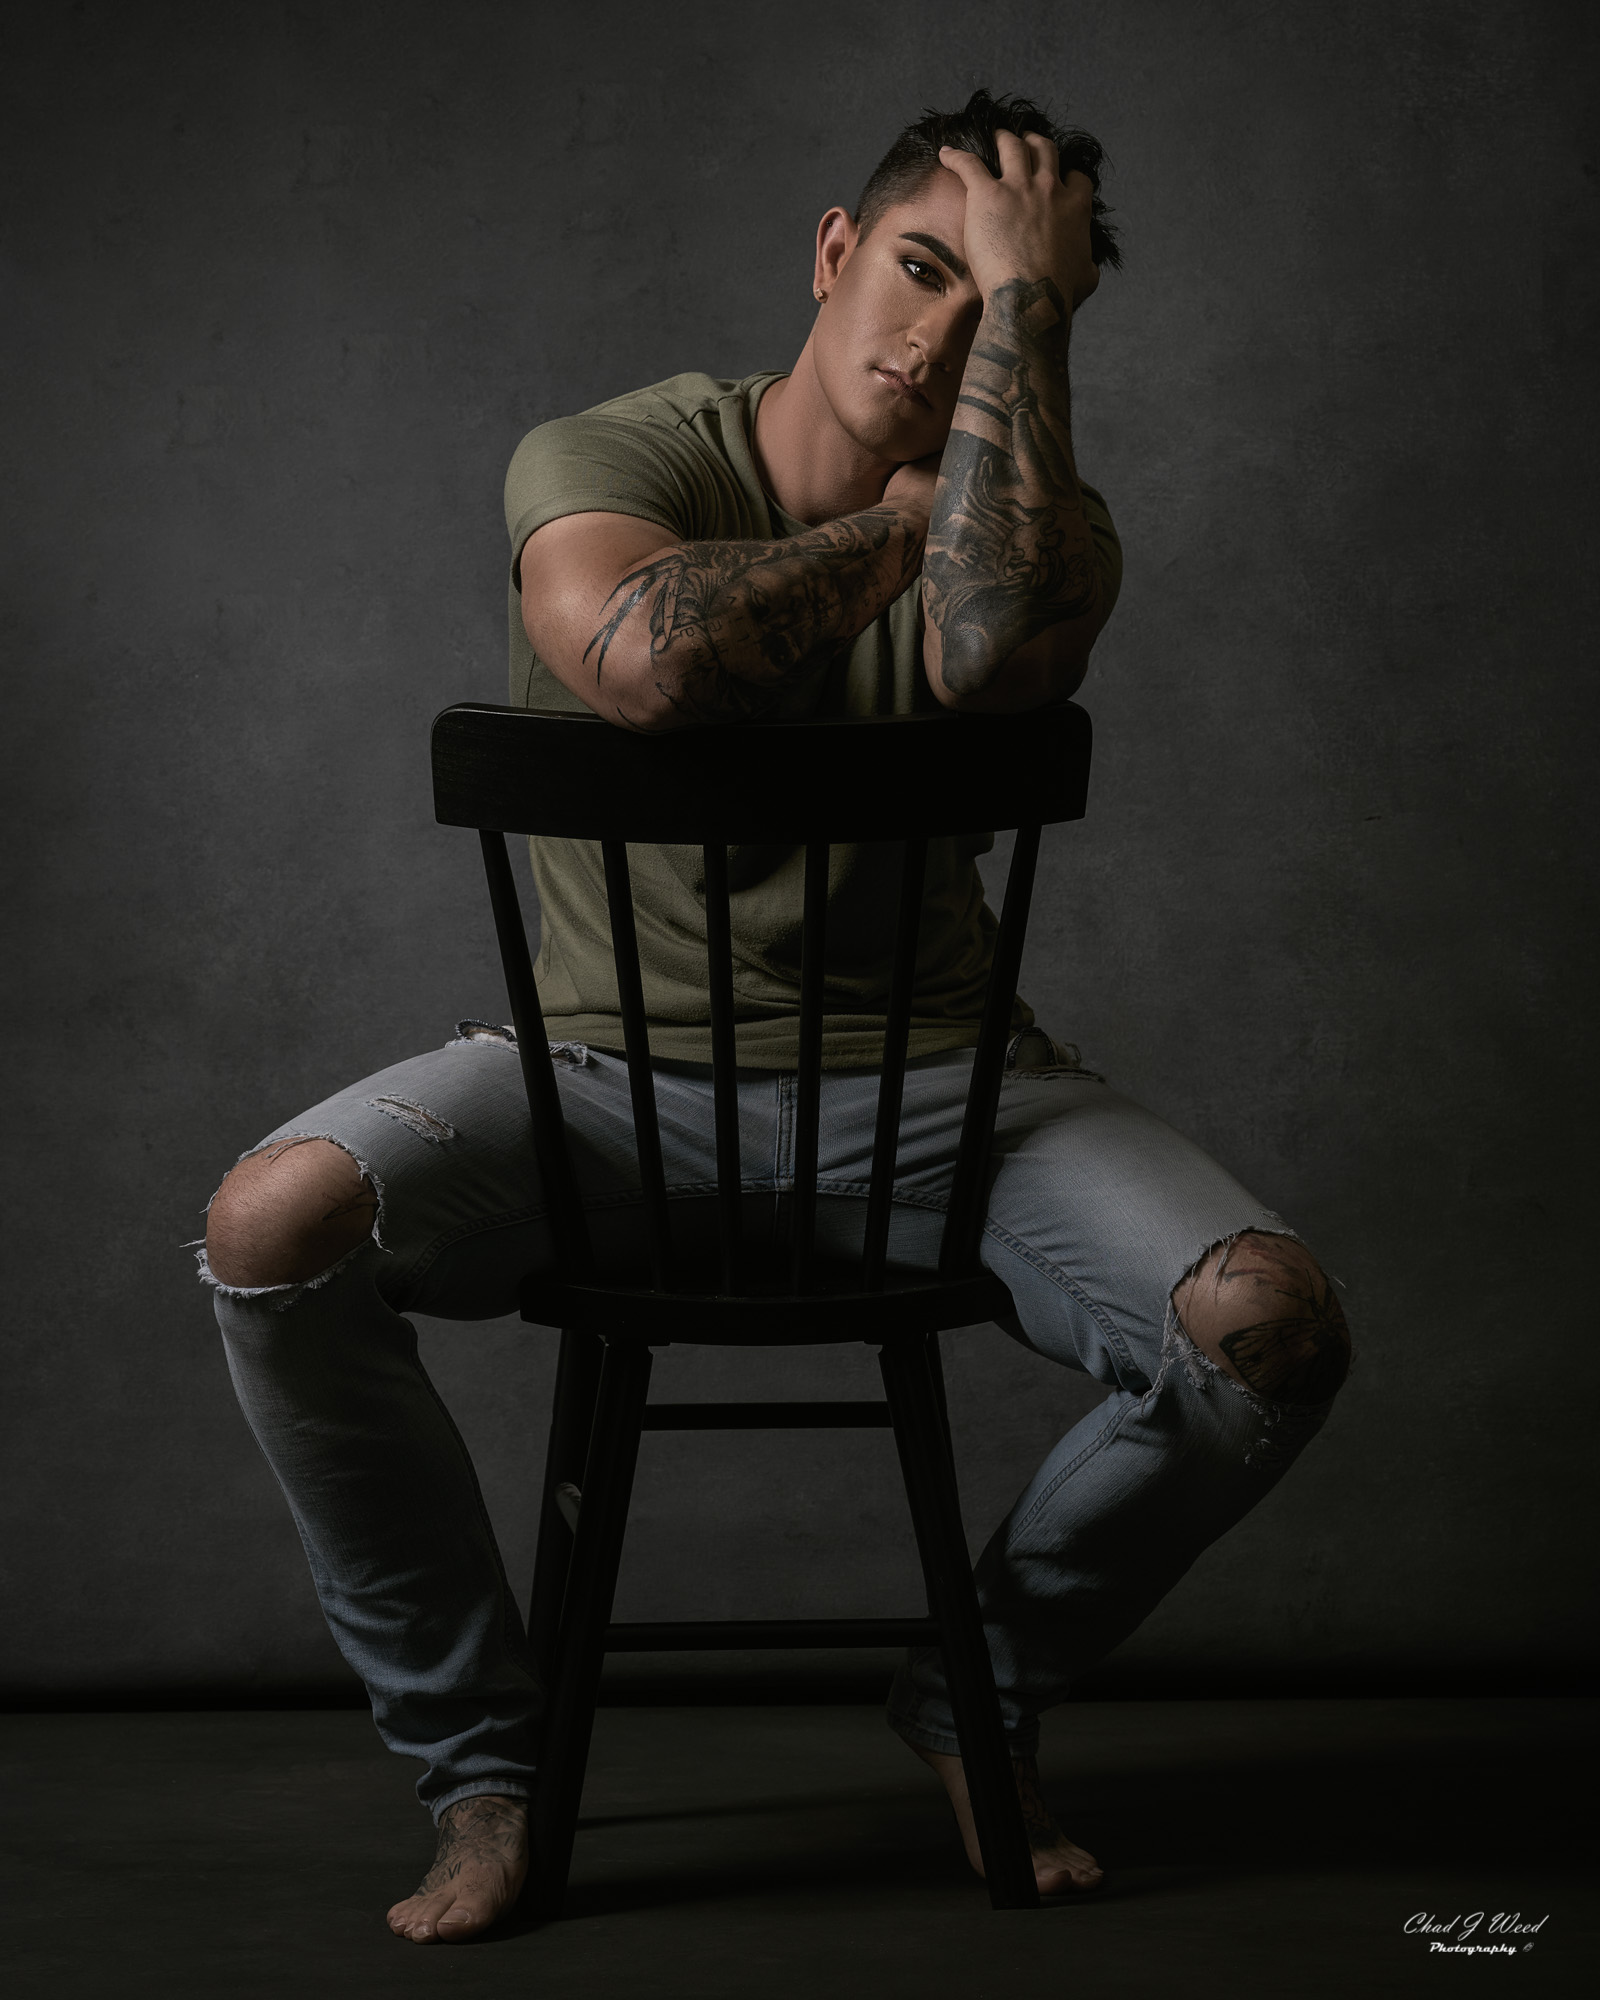 Arizona Glamour Portrait Photographer Chad Weed with Isaac